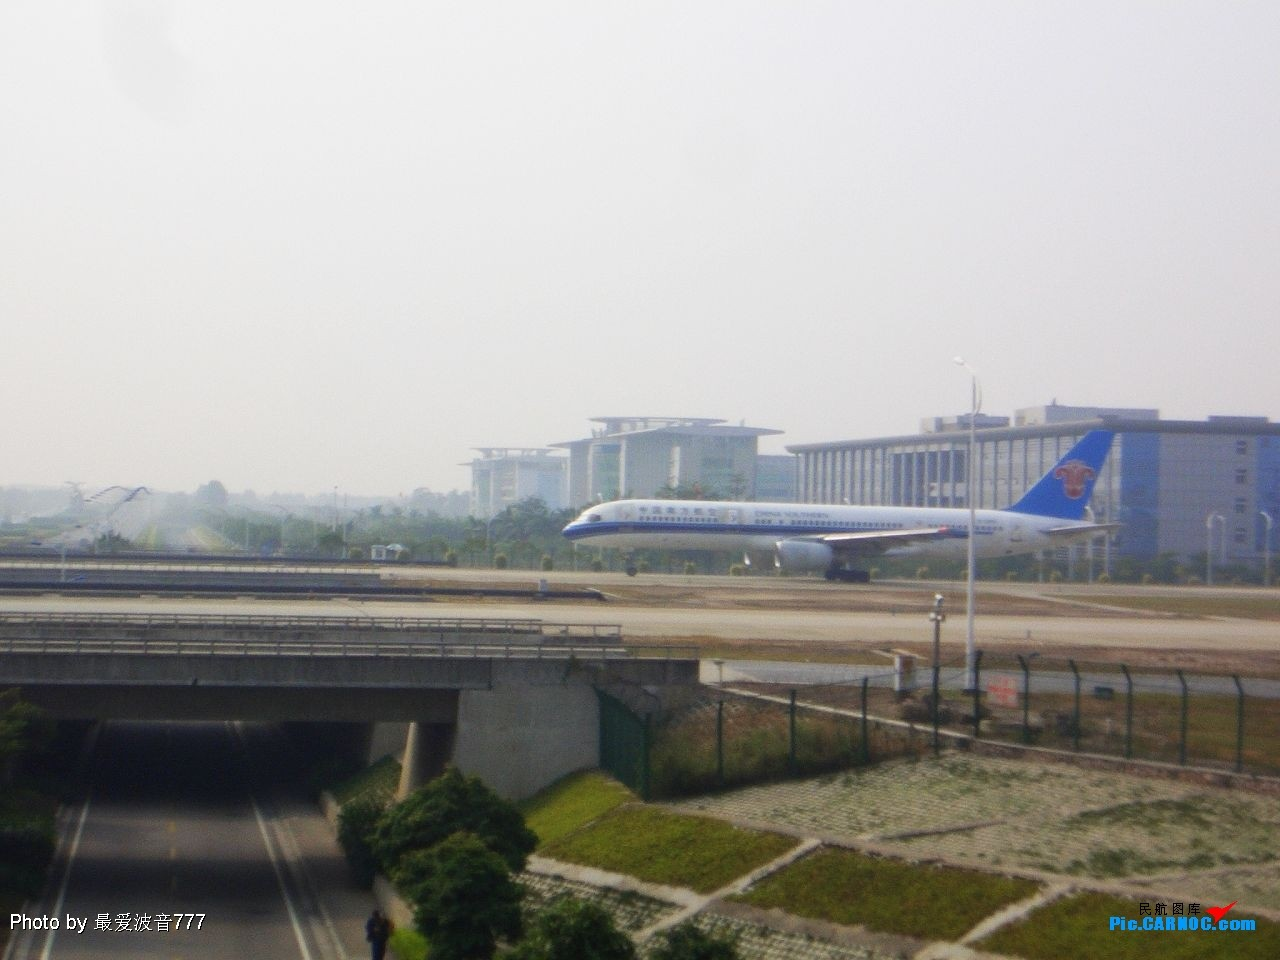 Re:[原创]新人的第二次试刀,18日新机场一日纪录 BOEING757-200  广州白云国际机场